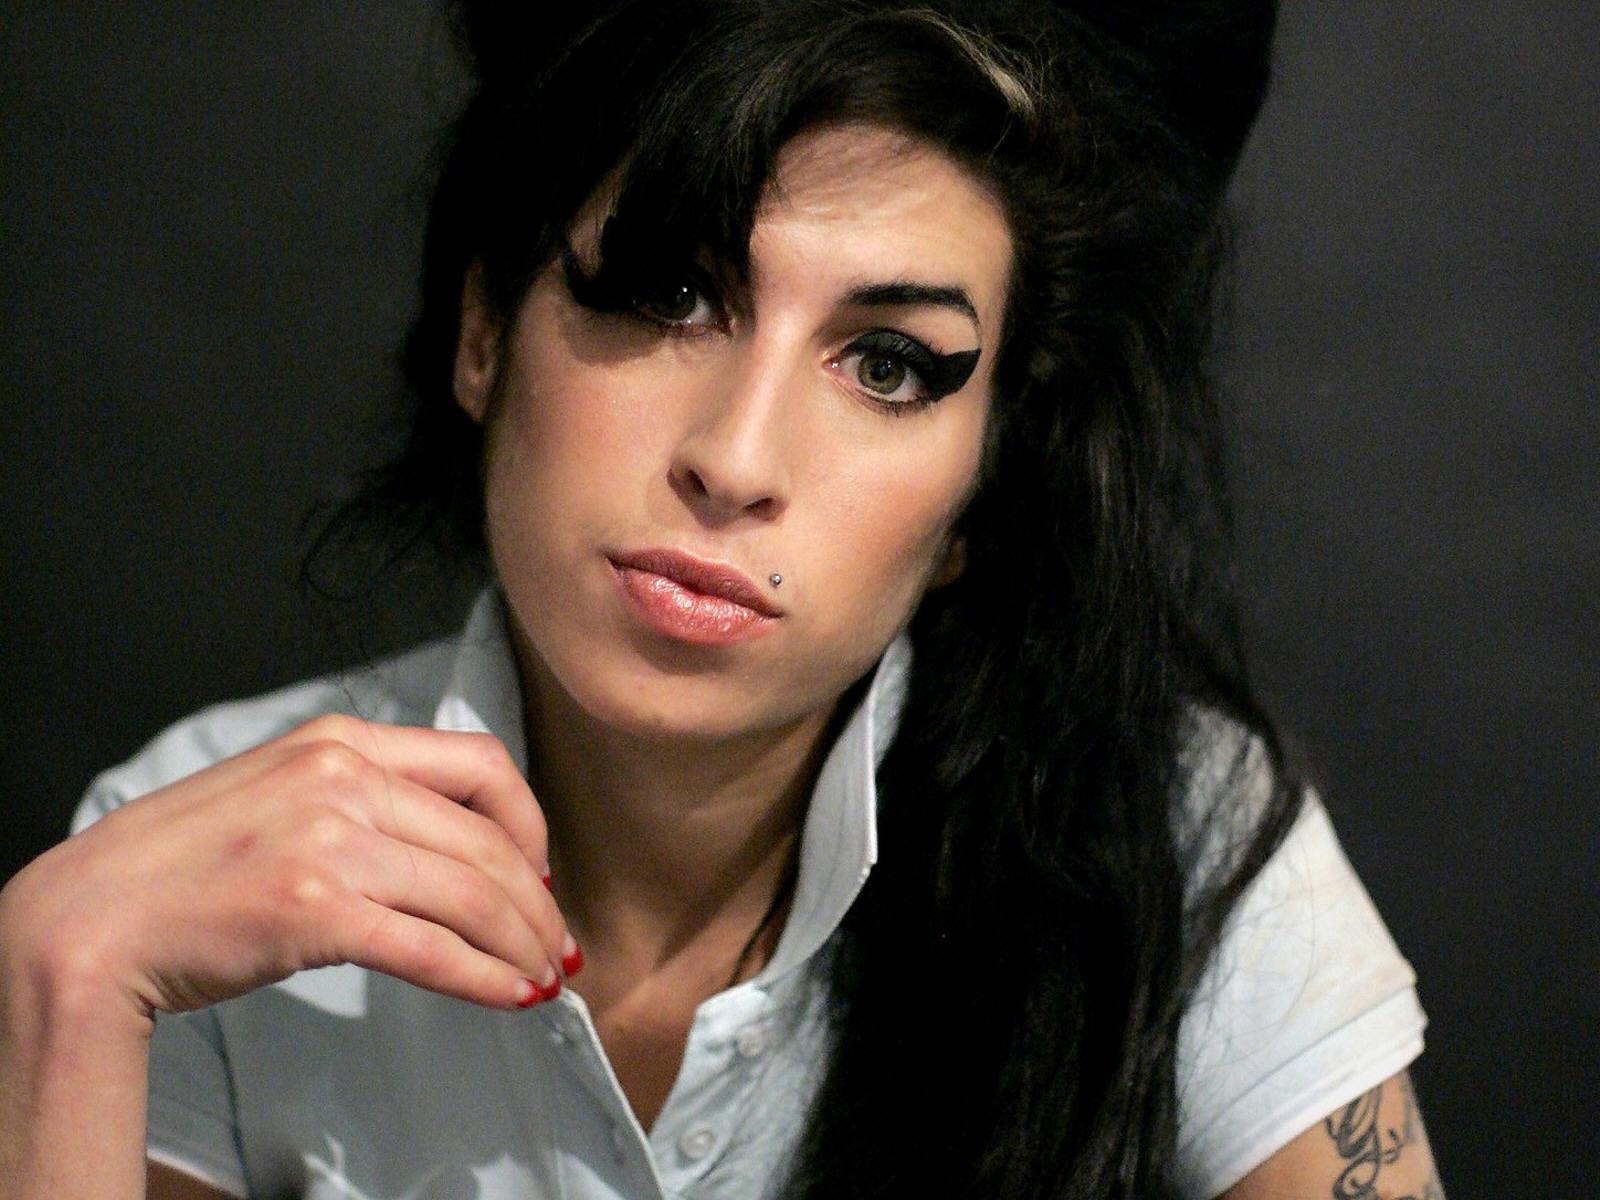 https://1.bp.blogspot.com/-kwxPM08sKoQ/TisNrvDK0FI/AAAAAAAABiY/NXxeArkZLCo/s1600/Amy_Winehouse_0016_1600X1200_Wallpaper.jpg